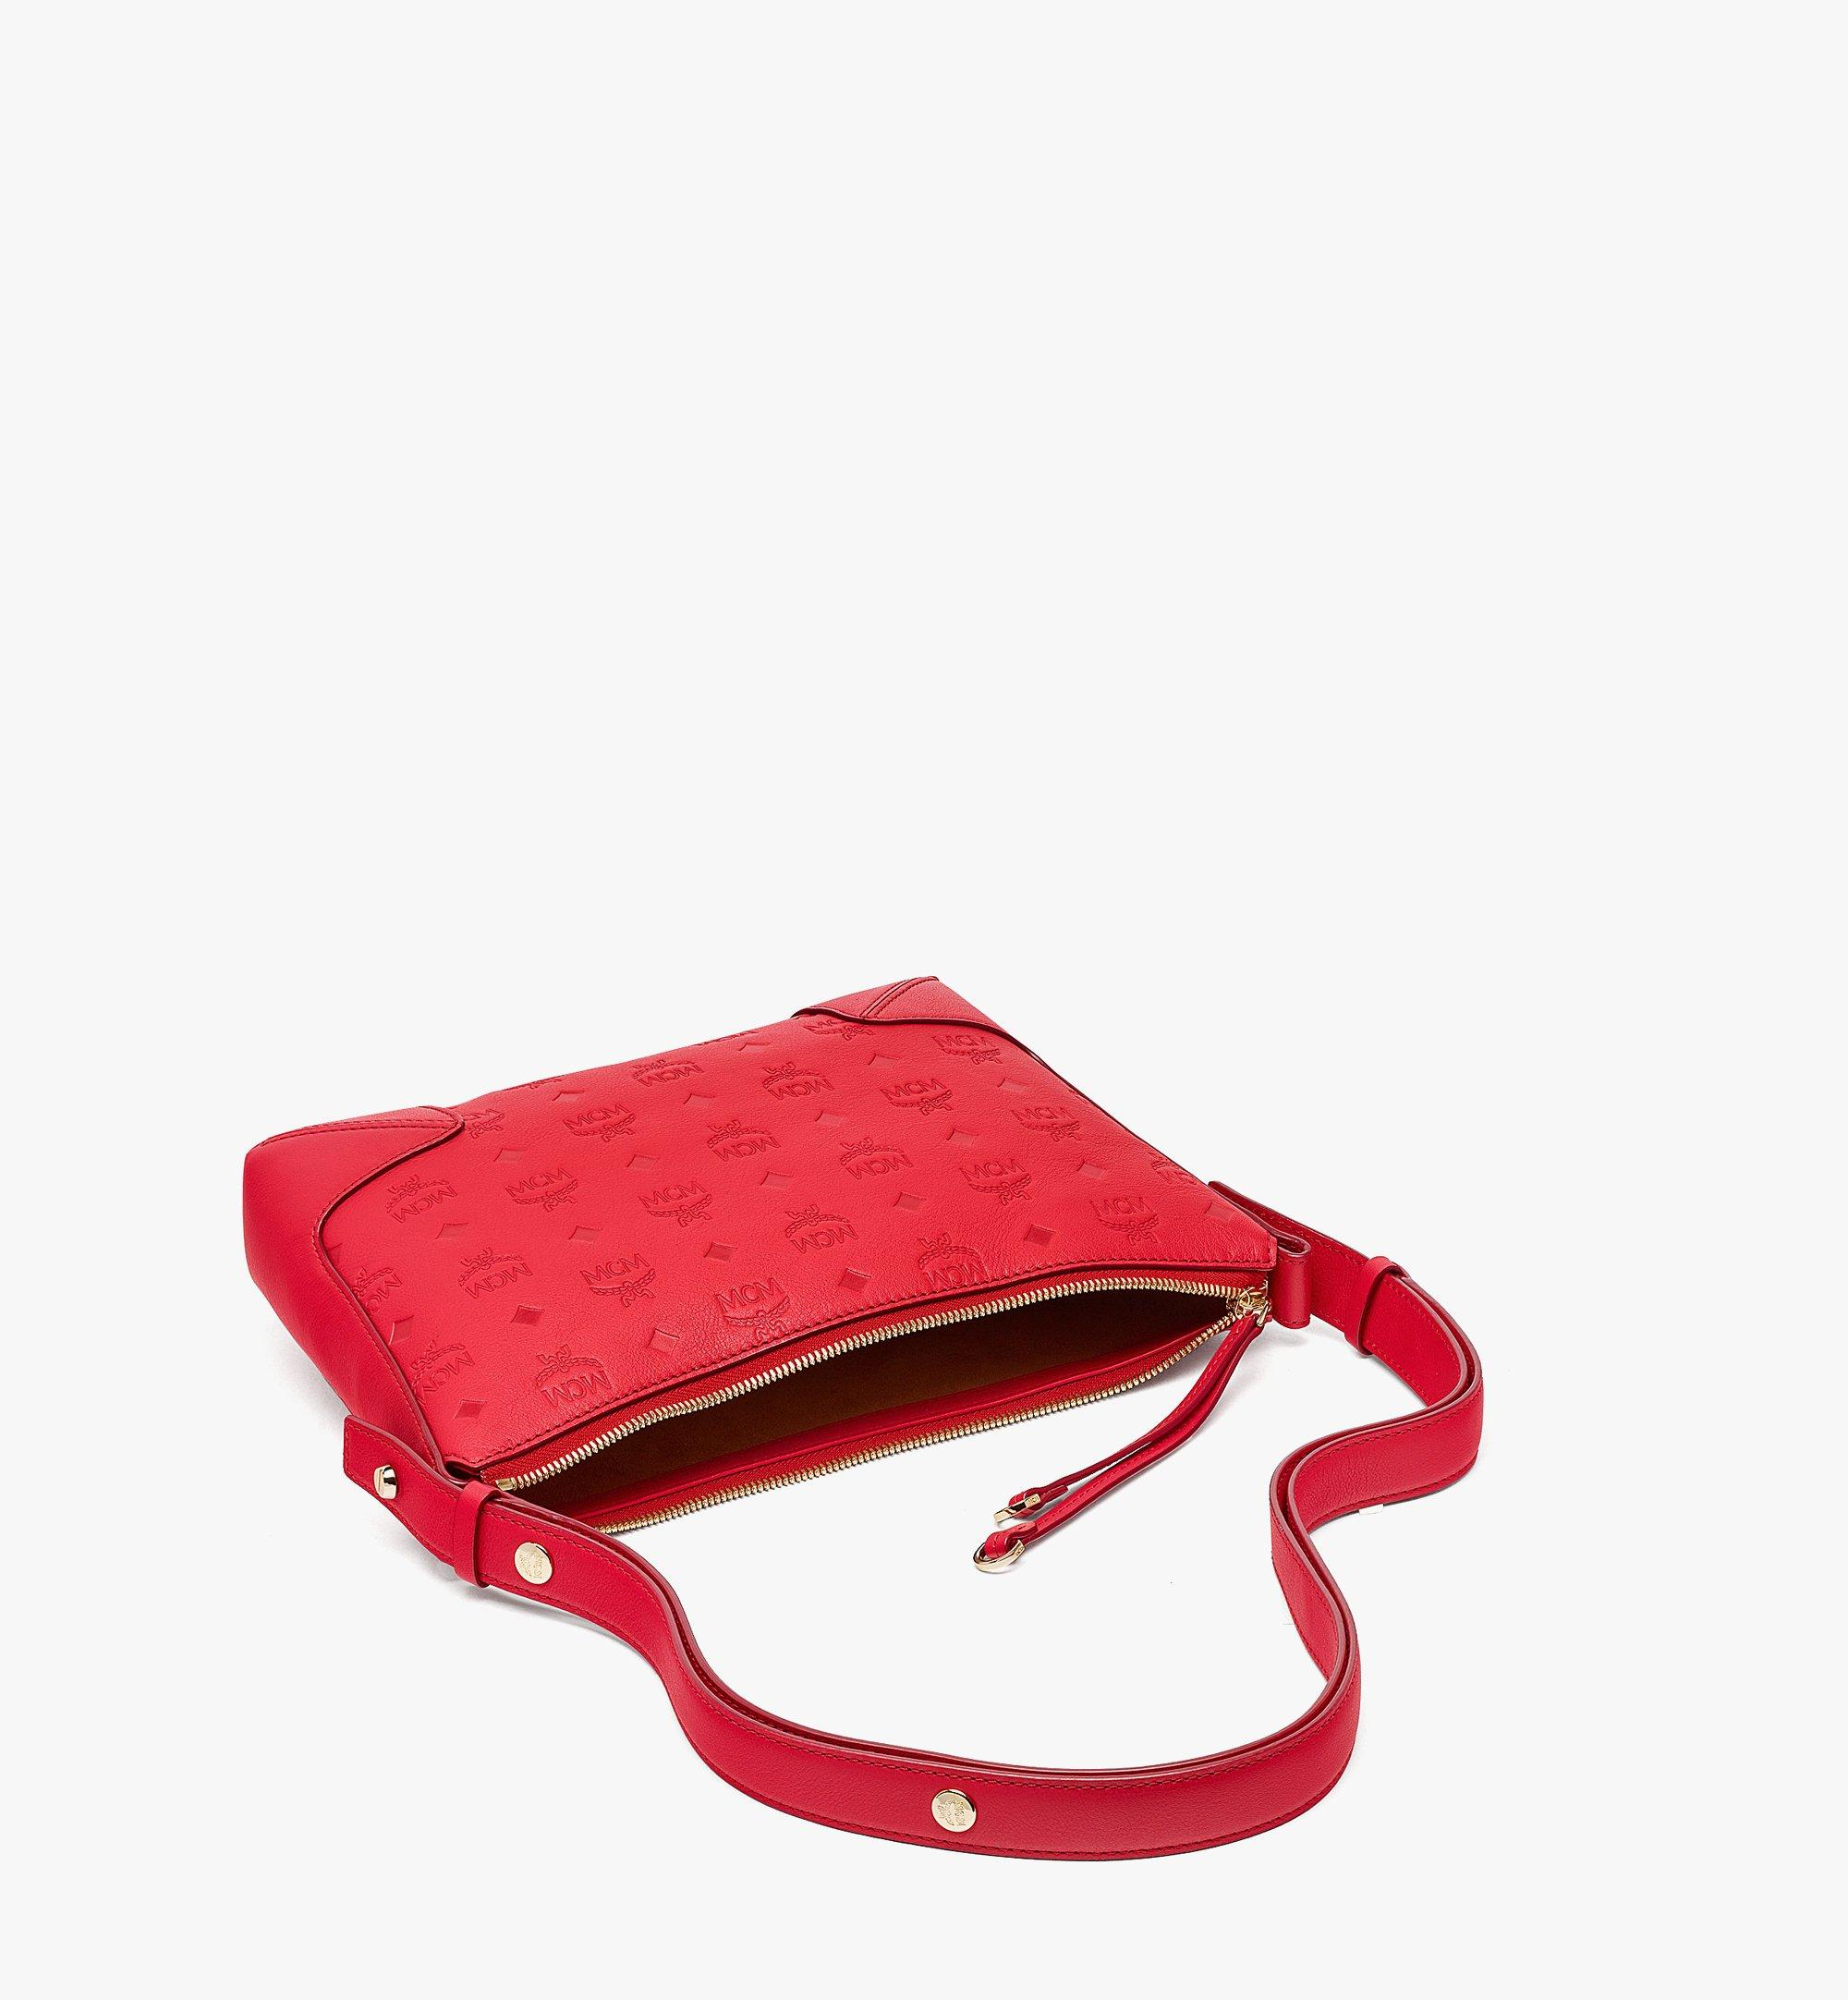 MCM Klara Shoulder Bag in Monogram Leather Red MWSBSKM02R0001 Alternate View 2